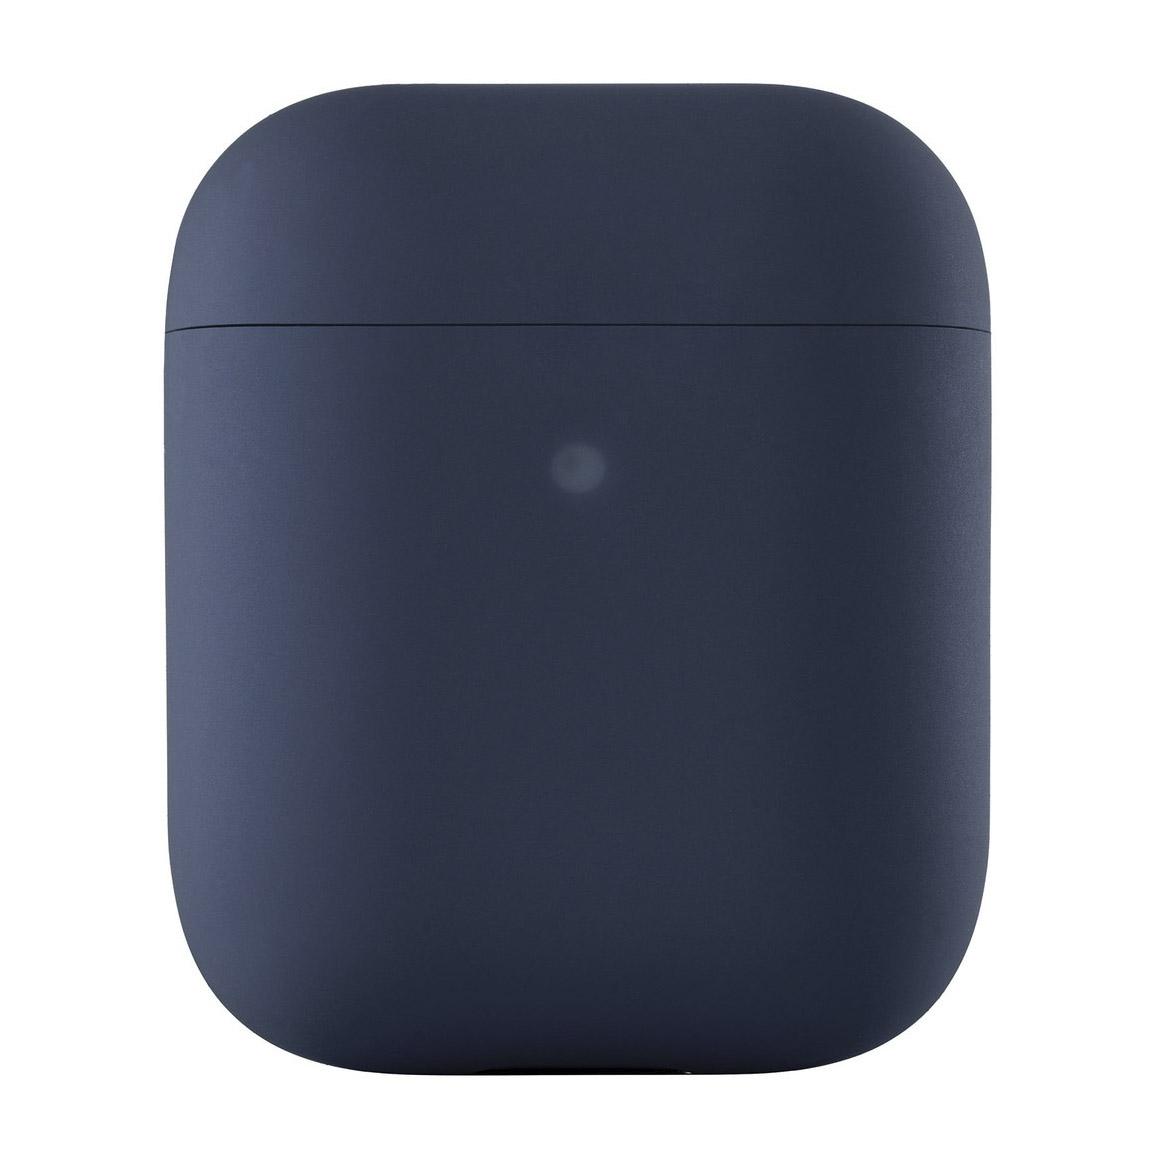 Чехол uBear для наушников Apple AirPods, синий чехол для наушников steward для apple airpods blue